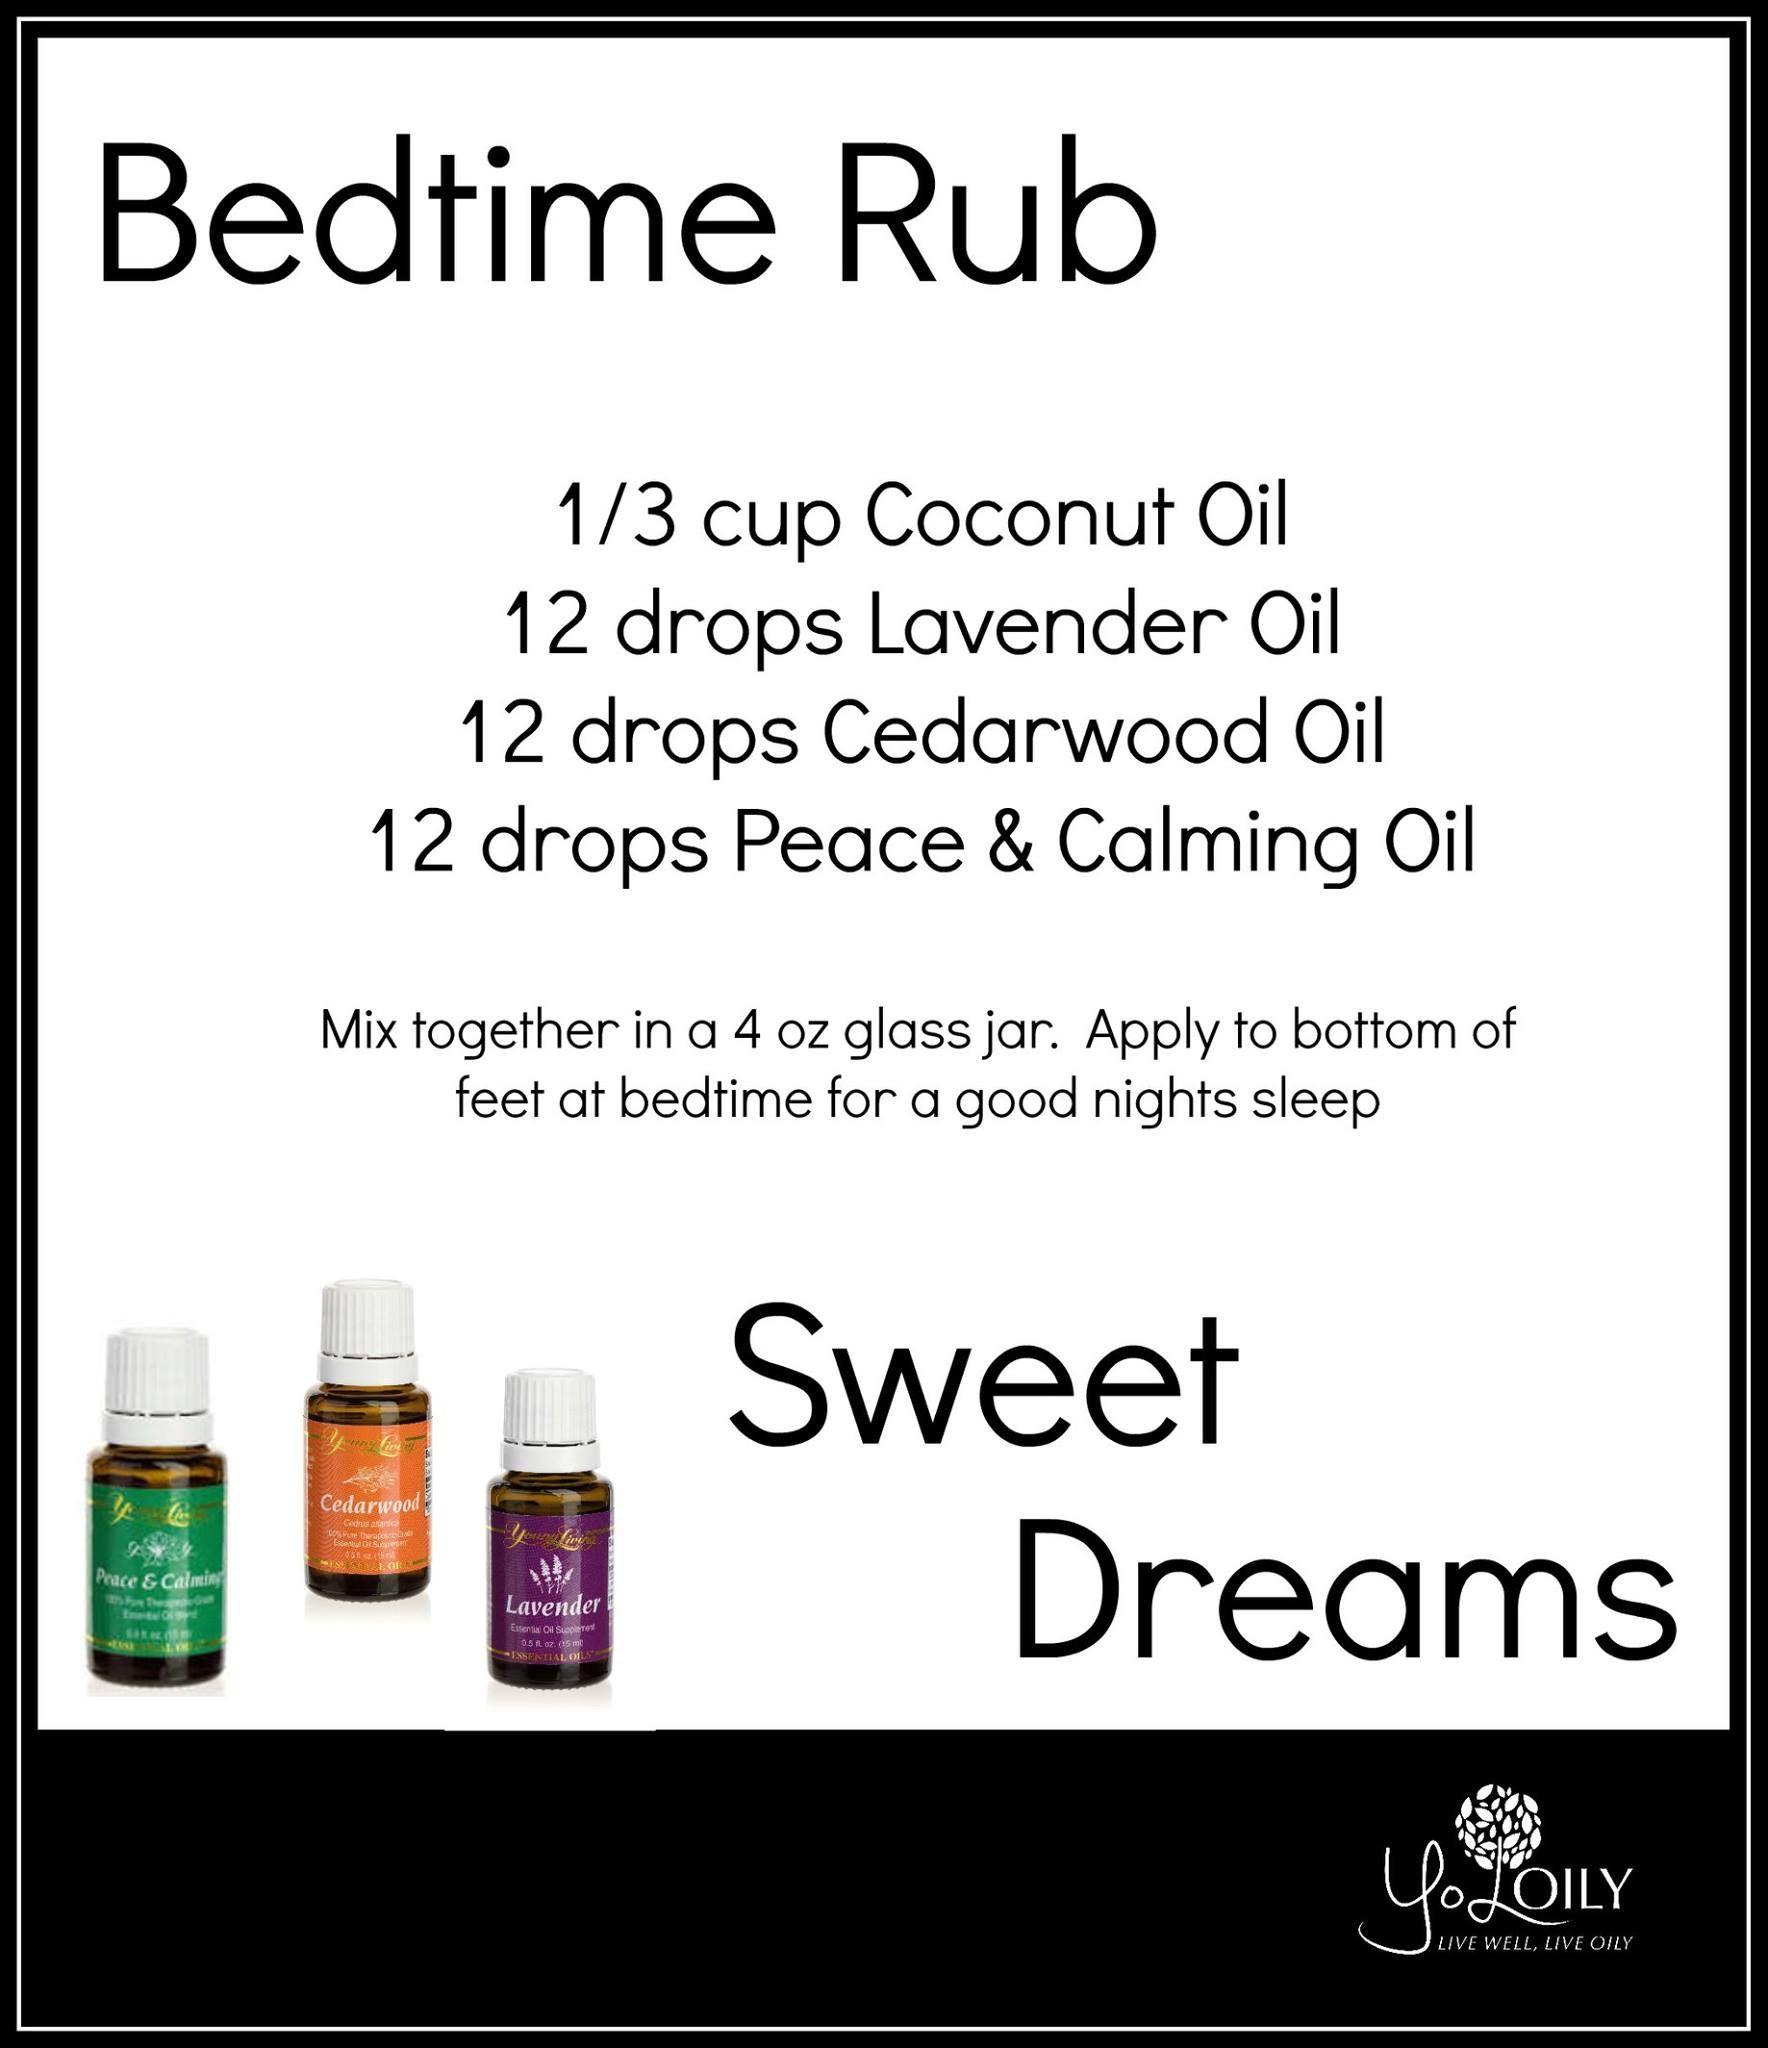 bedtime yl essential oils therische le und rezepte. Black Bedroom Furniture Sets. Home Design Ideas